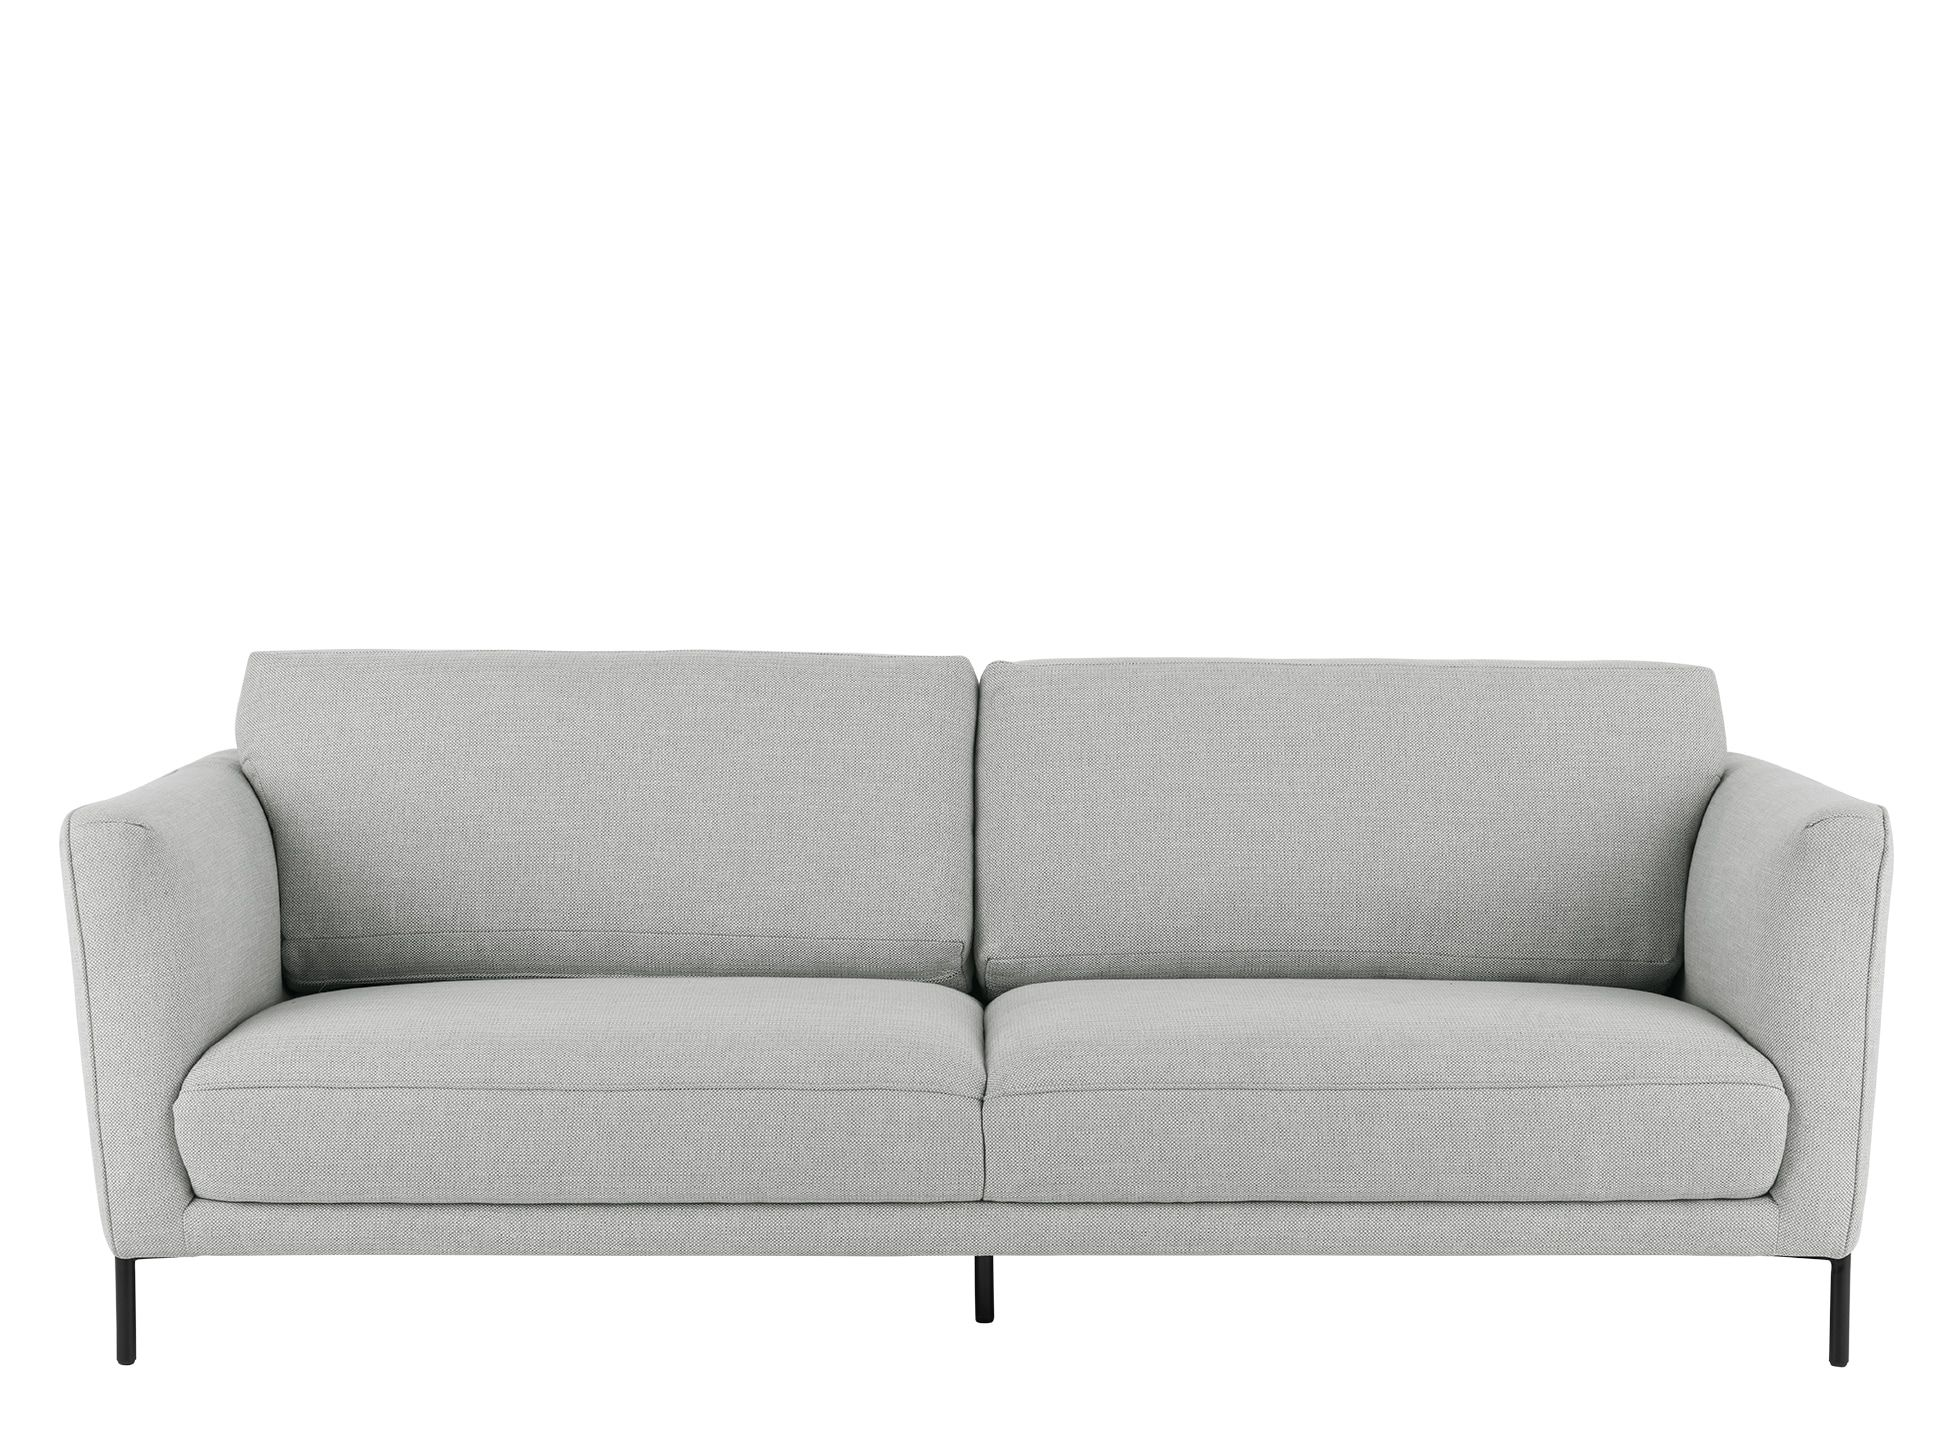 Everson 3 Seater Sofa Titan Grey In 2020 3 Seater Sofa Seater Sofa Sofa Design